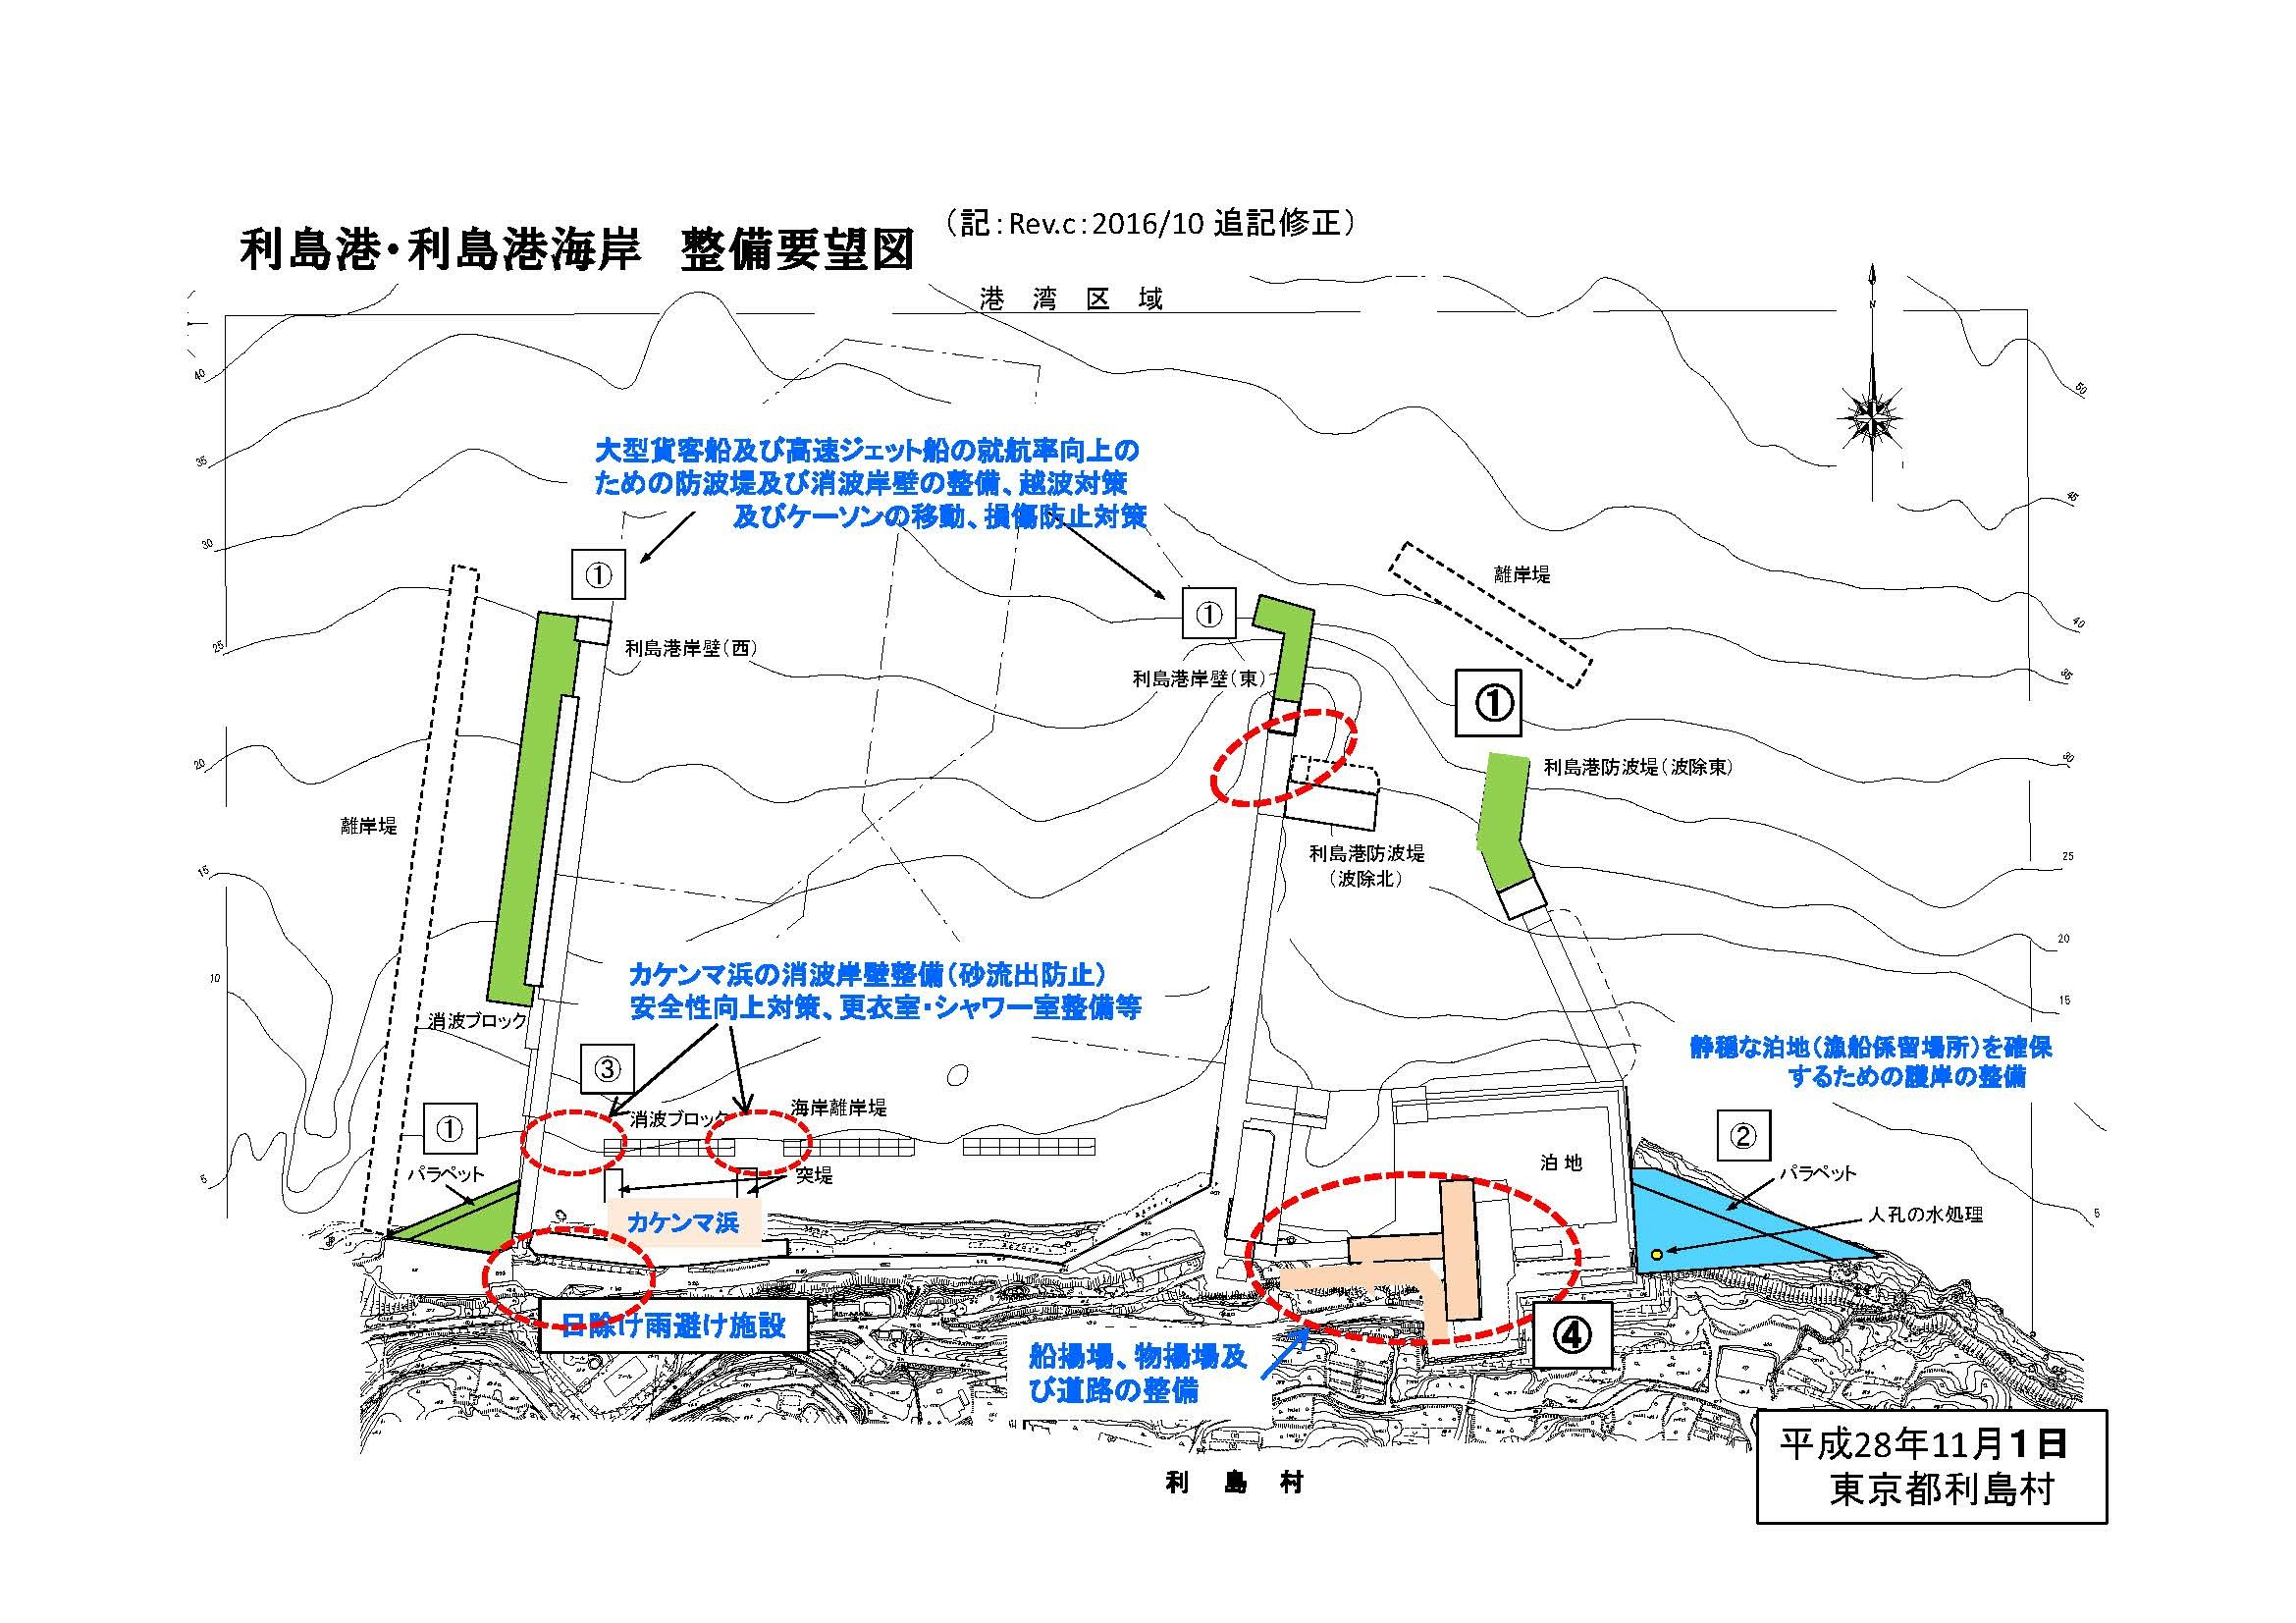 20161101国交省副局長 視察説明資料 プレゼン用02